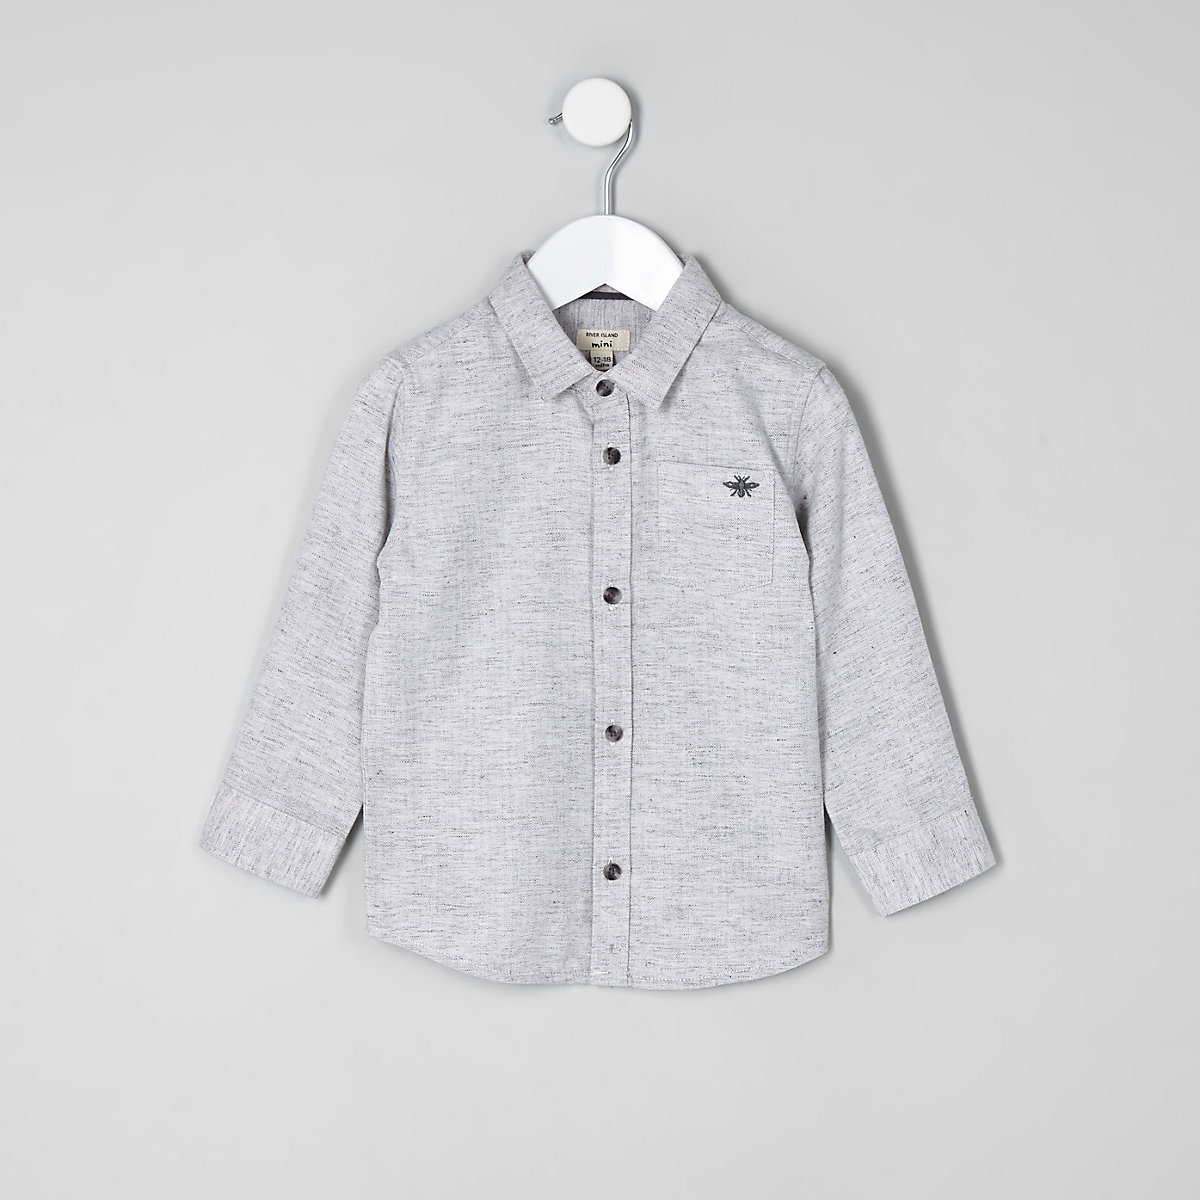 Chemise grise à chevrons mini garçon